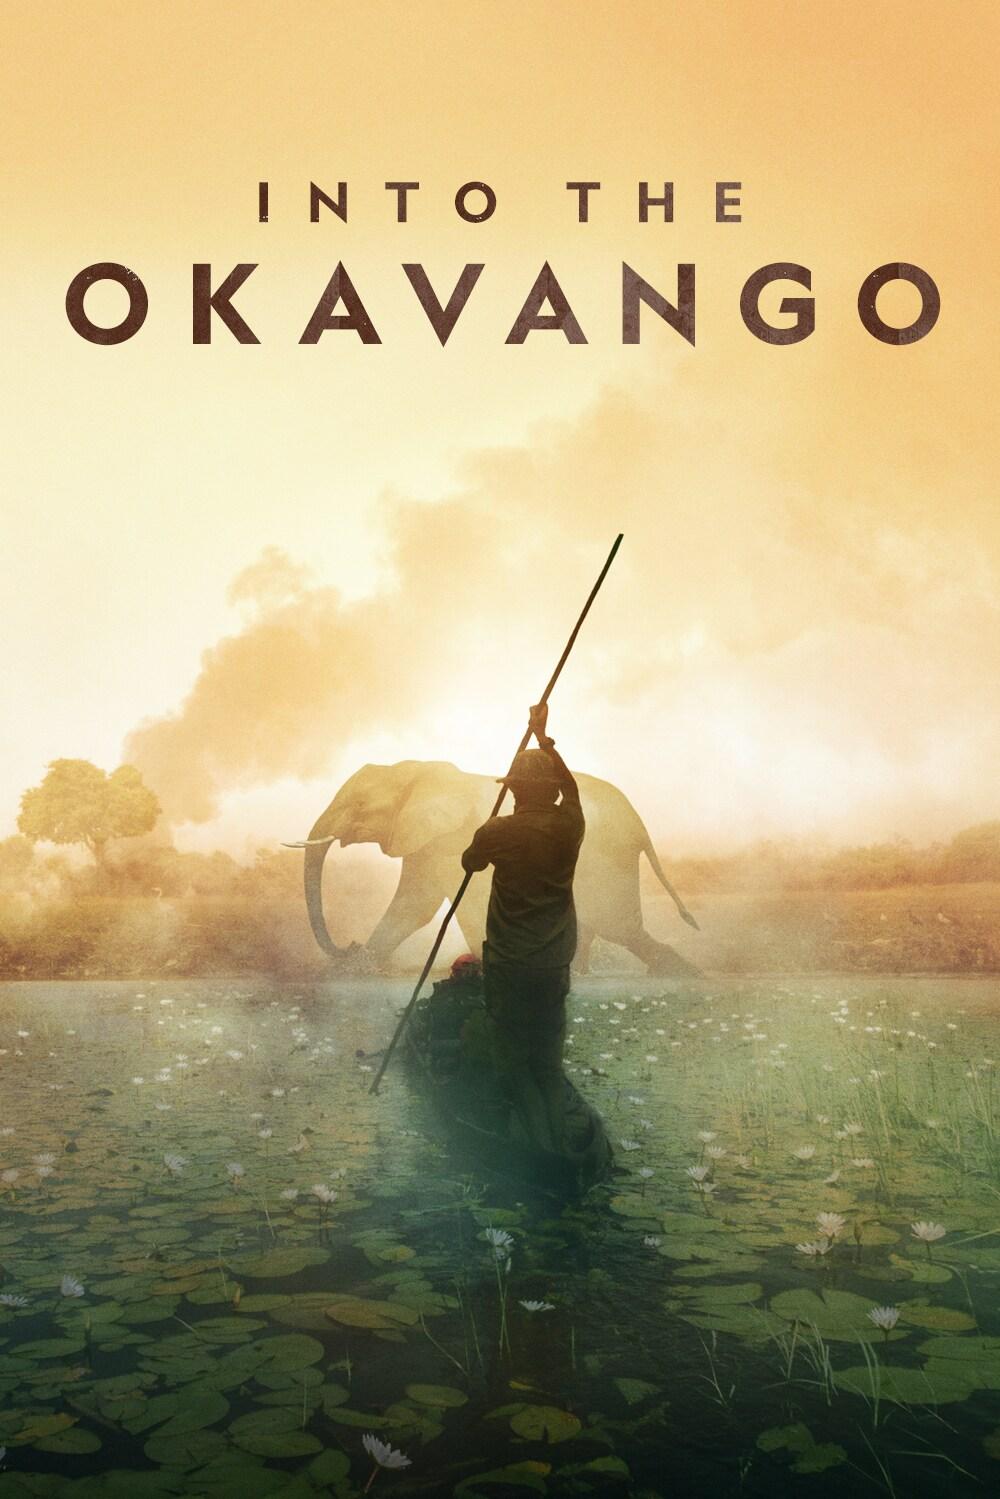 Into the Okavango (2018)